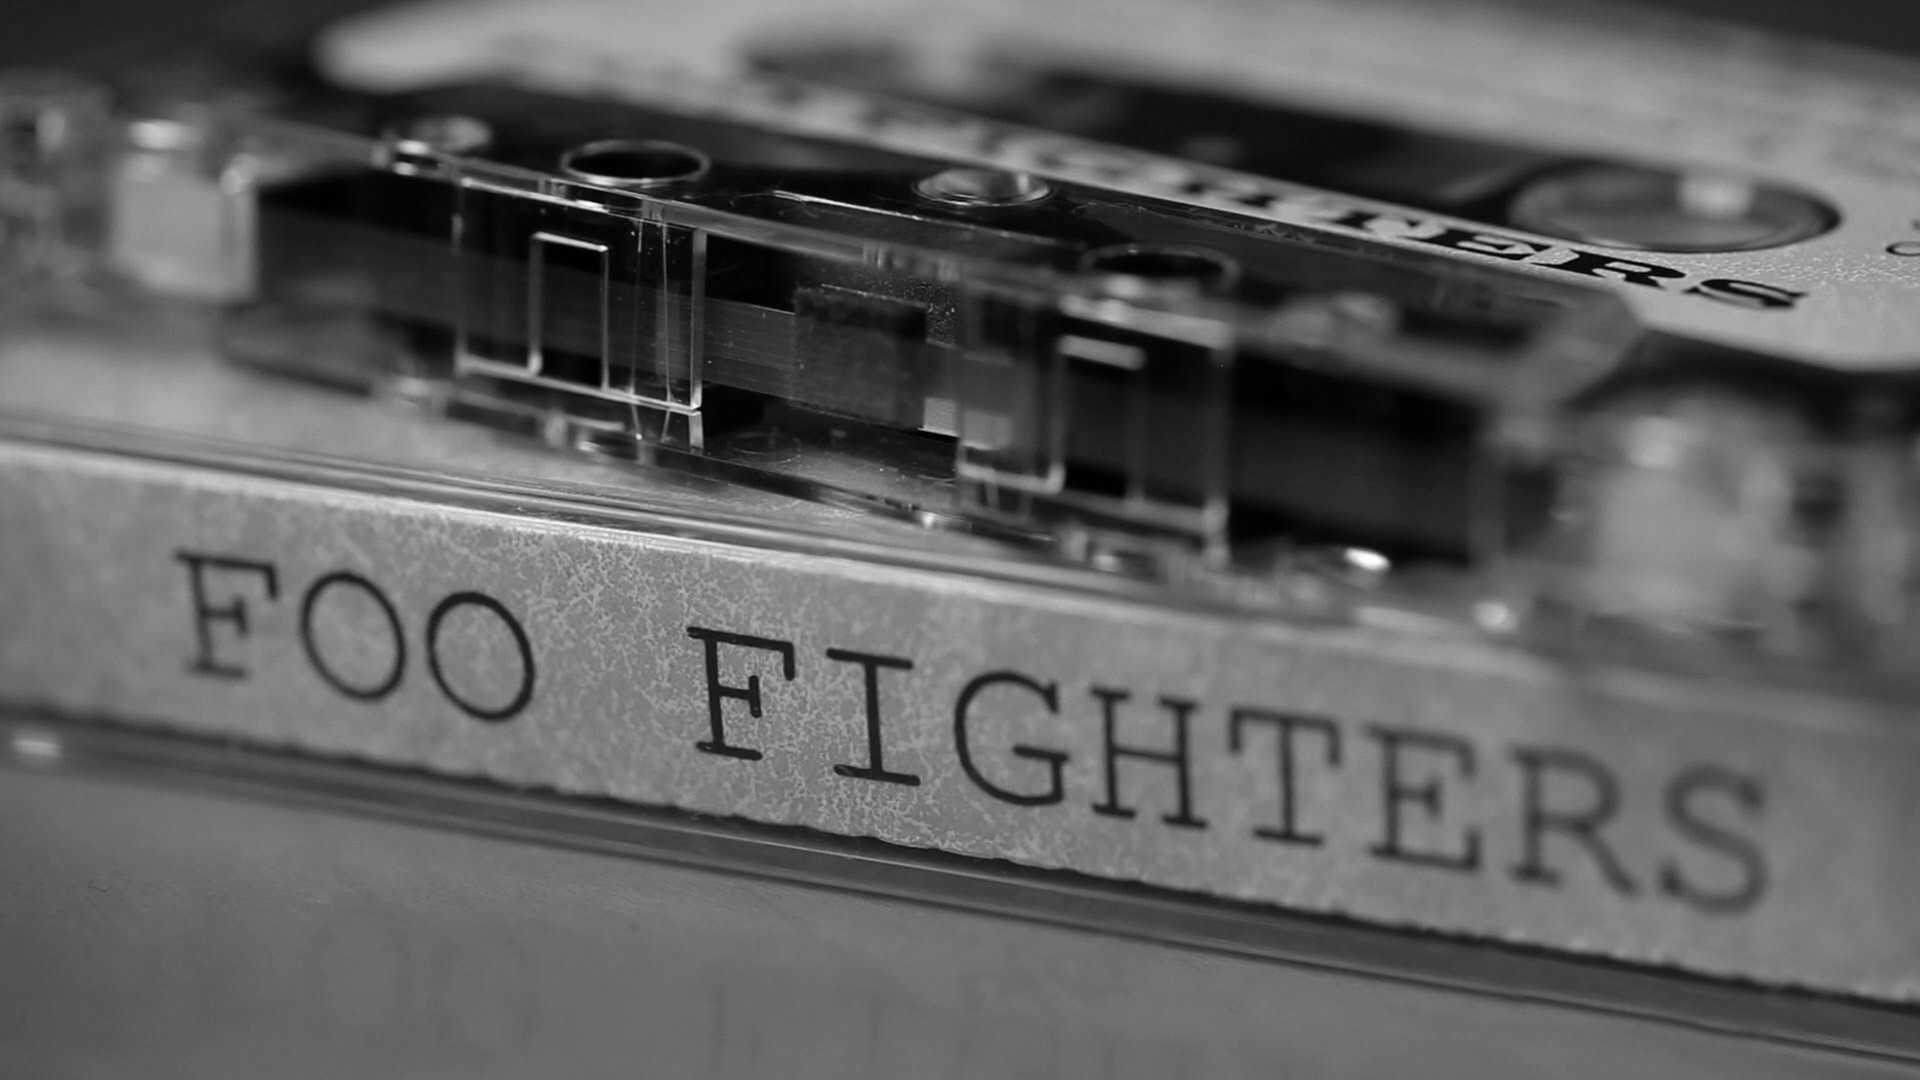 Free download Foo Fighters Computer Wallpapers Desktop Backgrounds  1920x1080 ID [1920x1080] for your Desktop, Mobile & Tablet   Explore 49+ Foo  Fighters Wallpaper 1280x800   Foo Fighters Wallpaper 1280x800, Foo Fighters  Wallpaper,